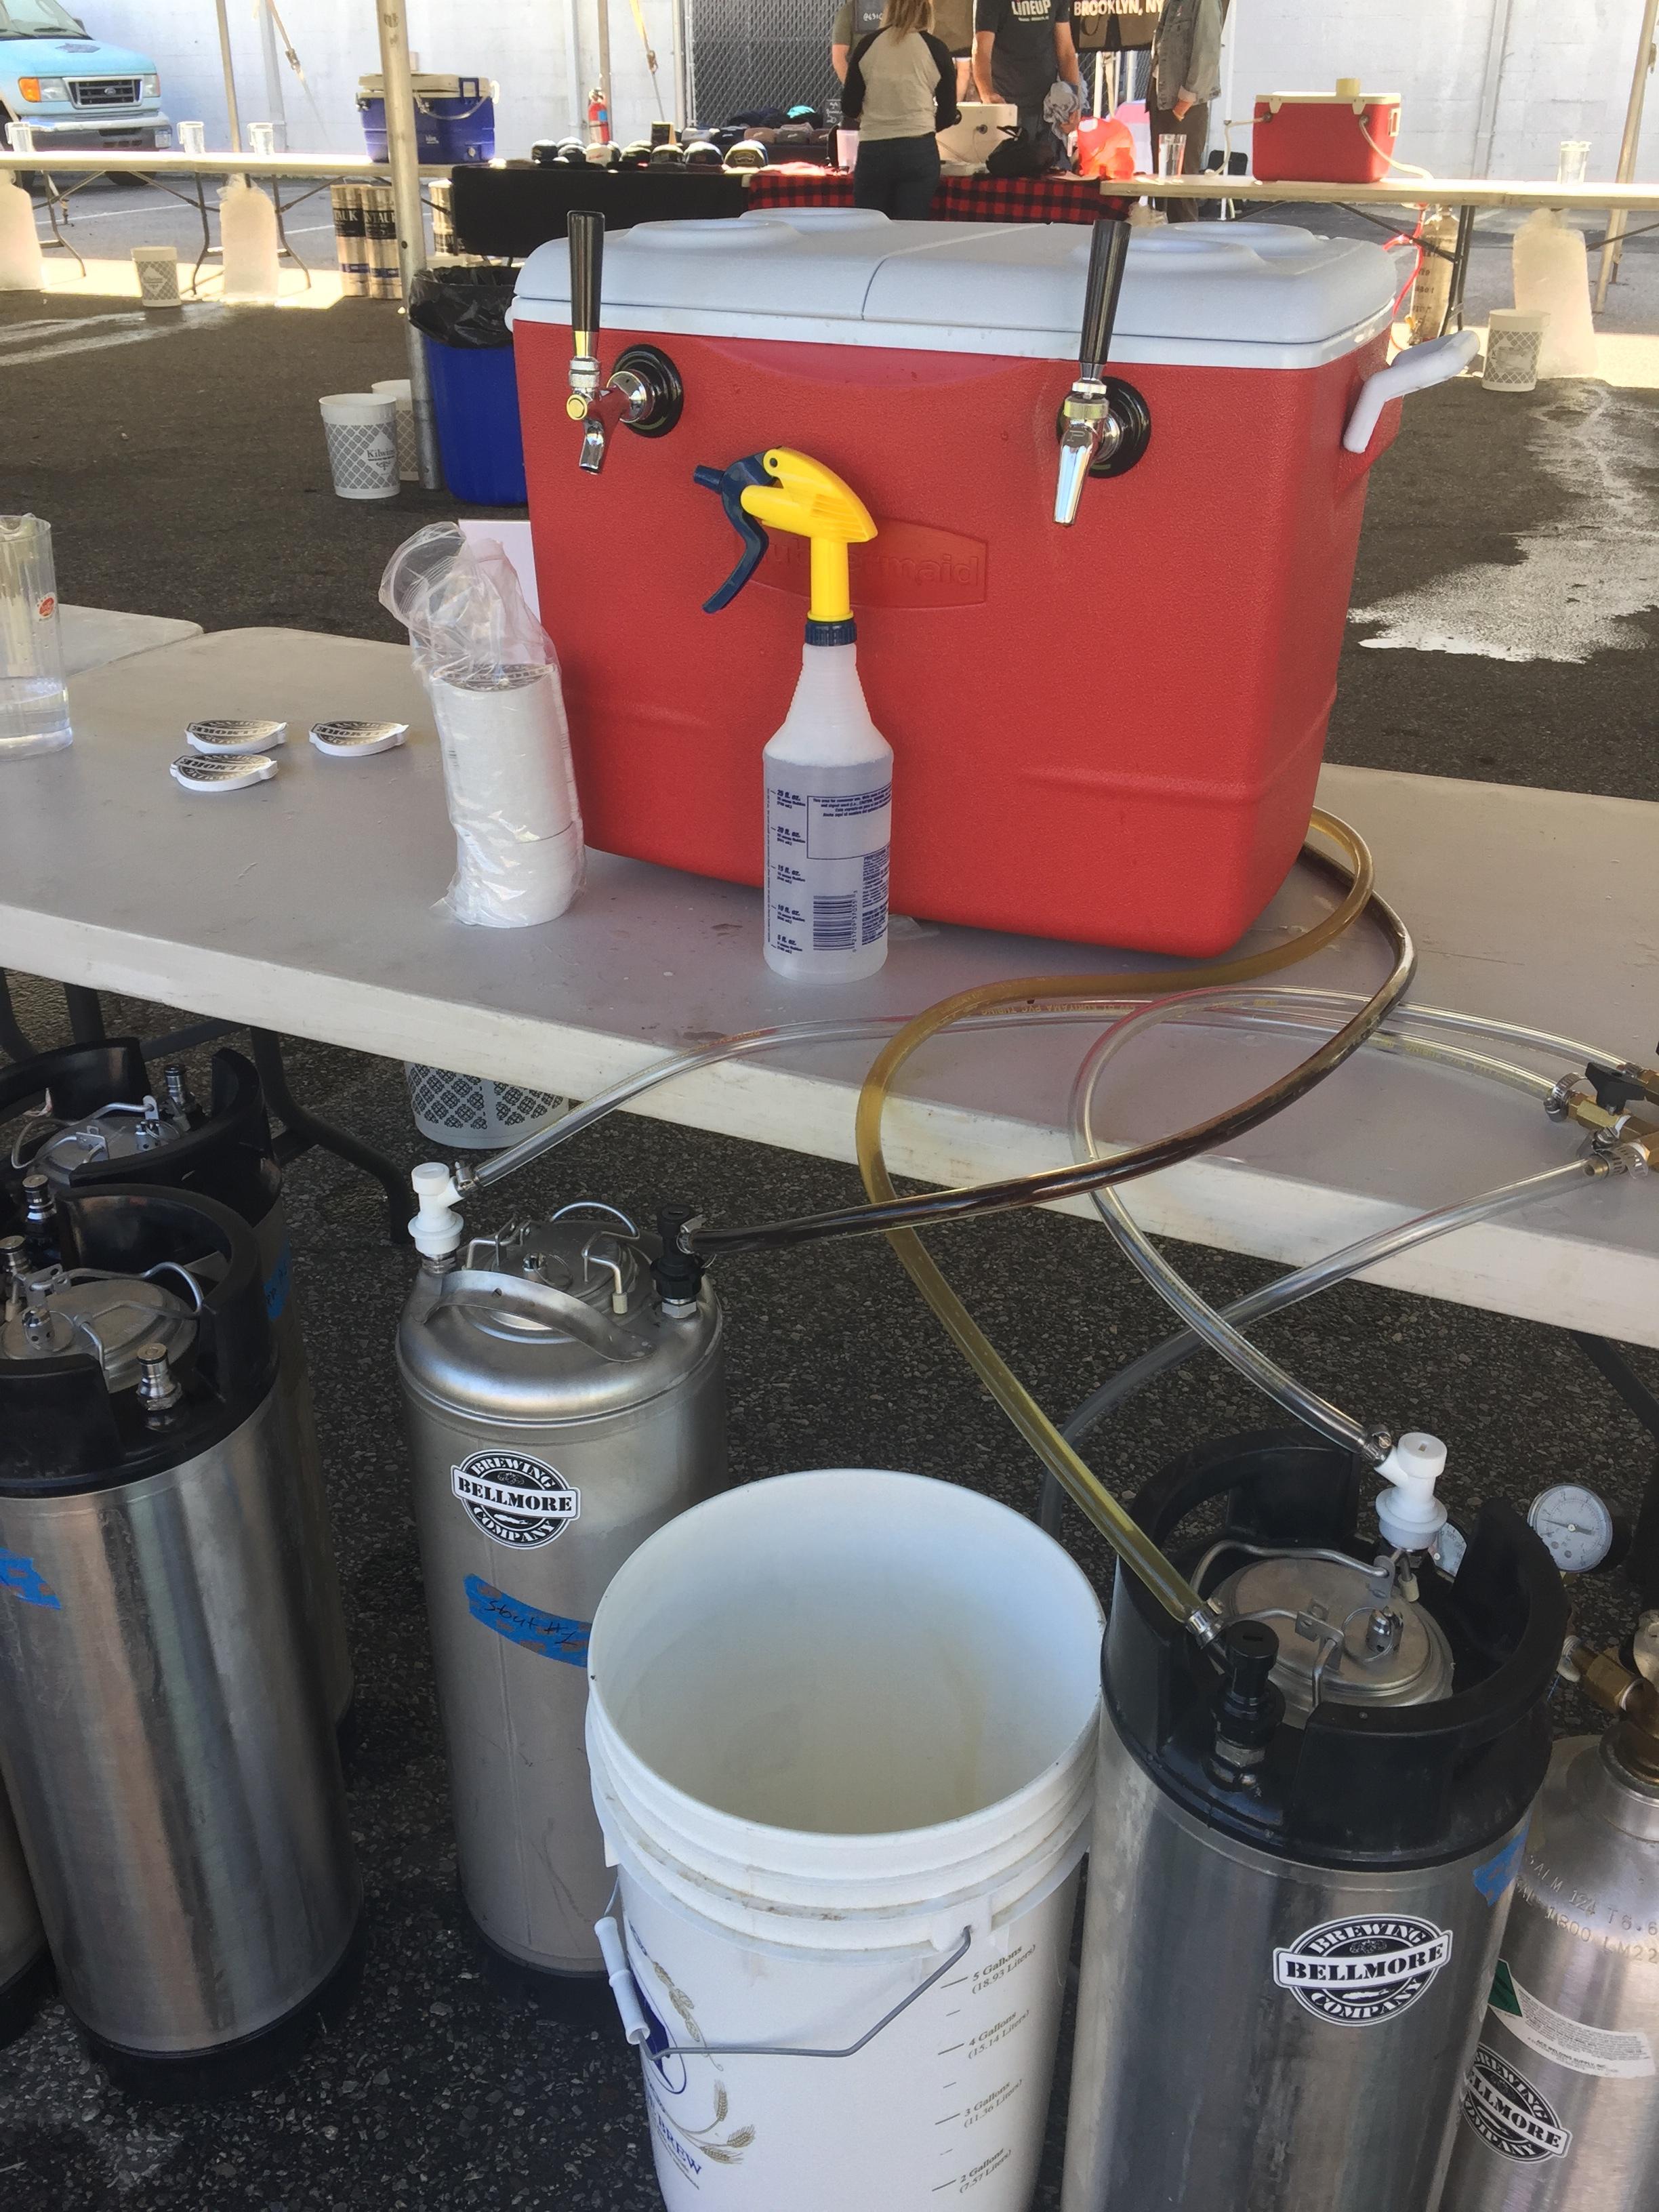 bellmore brewing punktoberfest 2017 booth setup 2.JPG